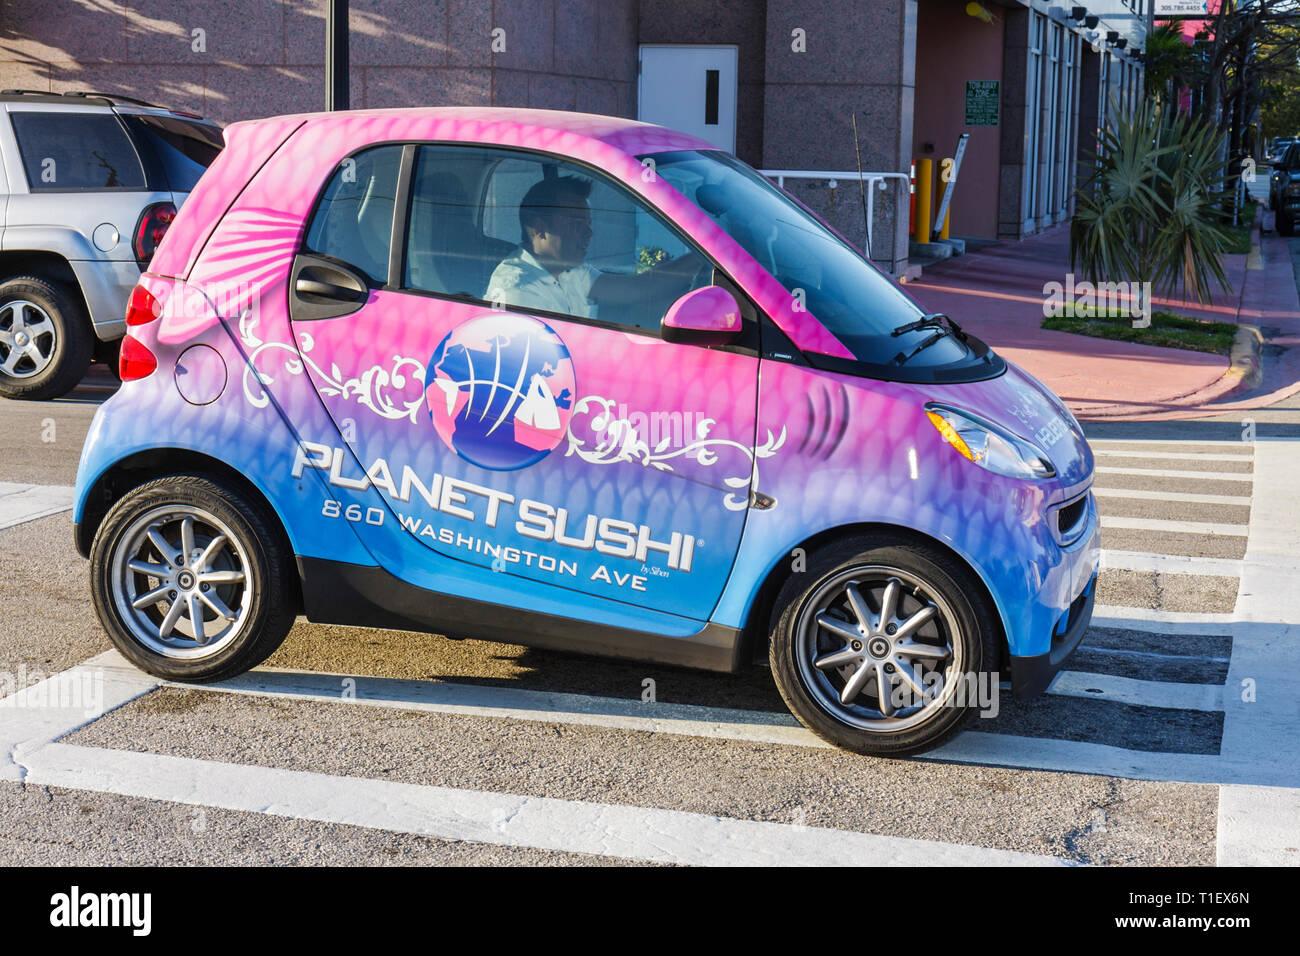 Miami Beach Florida Planet Sushi restaurant smart fortwo coupe car auto alternative transportation fuel efficient recyclable mat - Stock Image